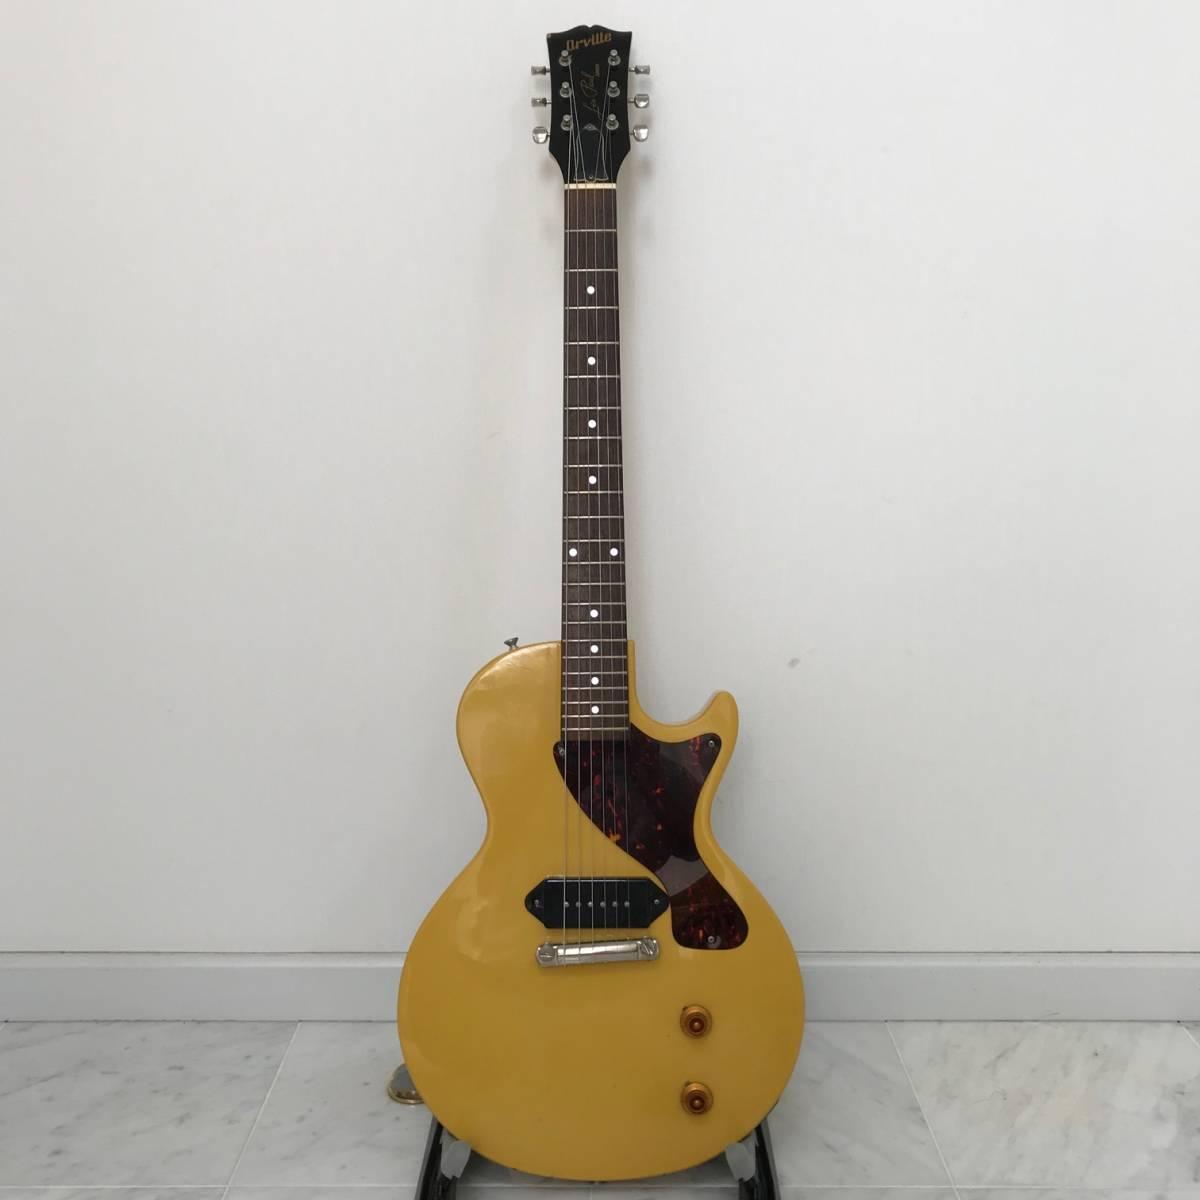 Orville by Gibson Les Paul Junior オービル バイ ギブソン レスポールジュニア イエロー 重量3.6kg